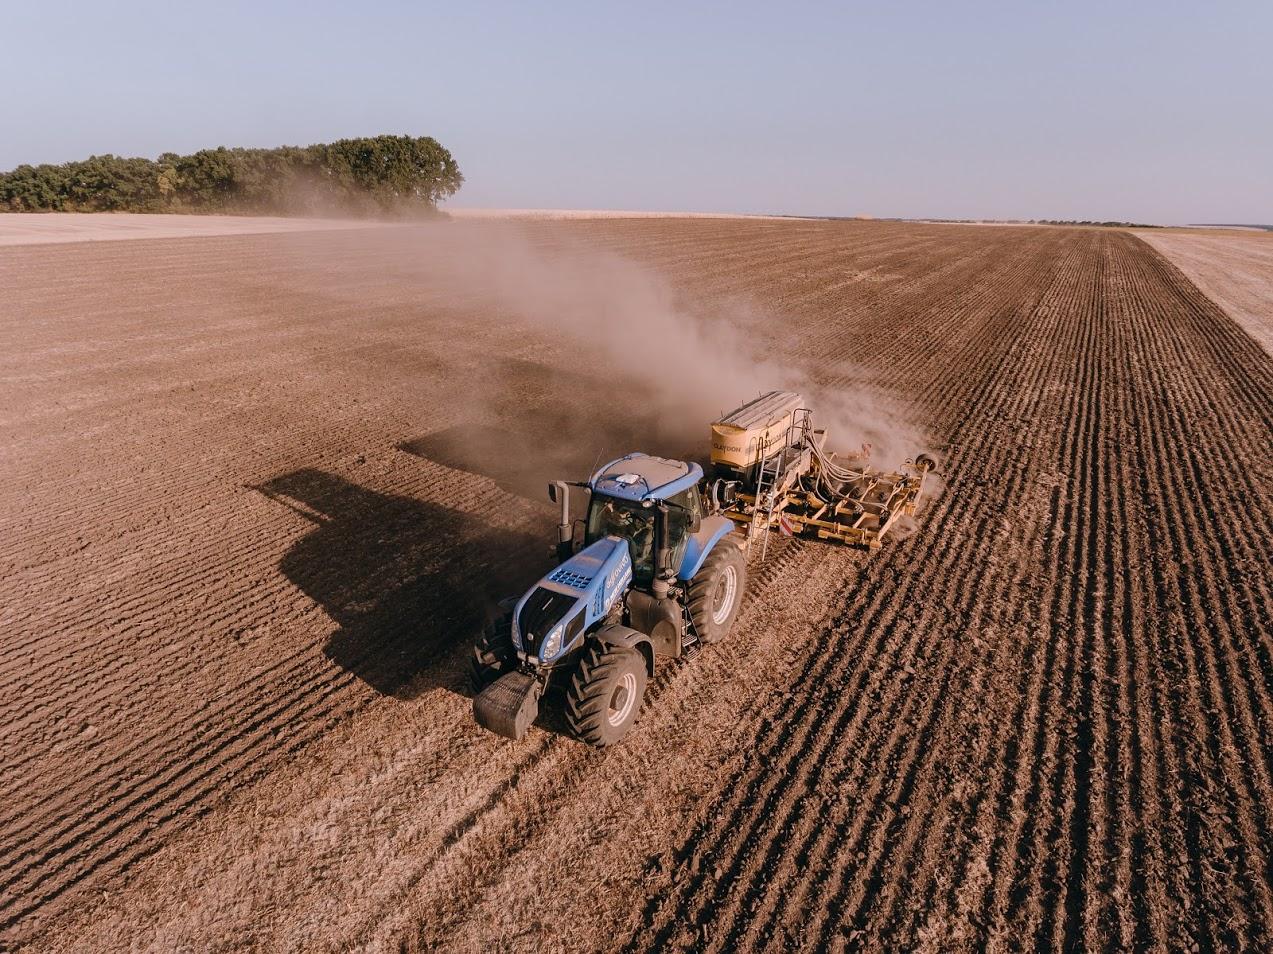 traktor_3.jpg (456 KB)